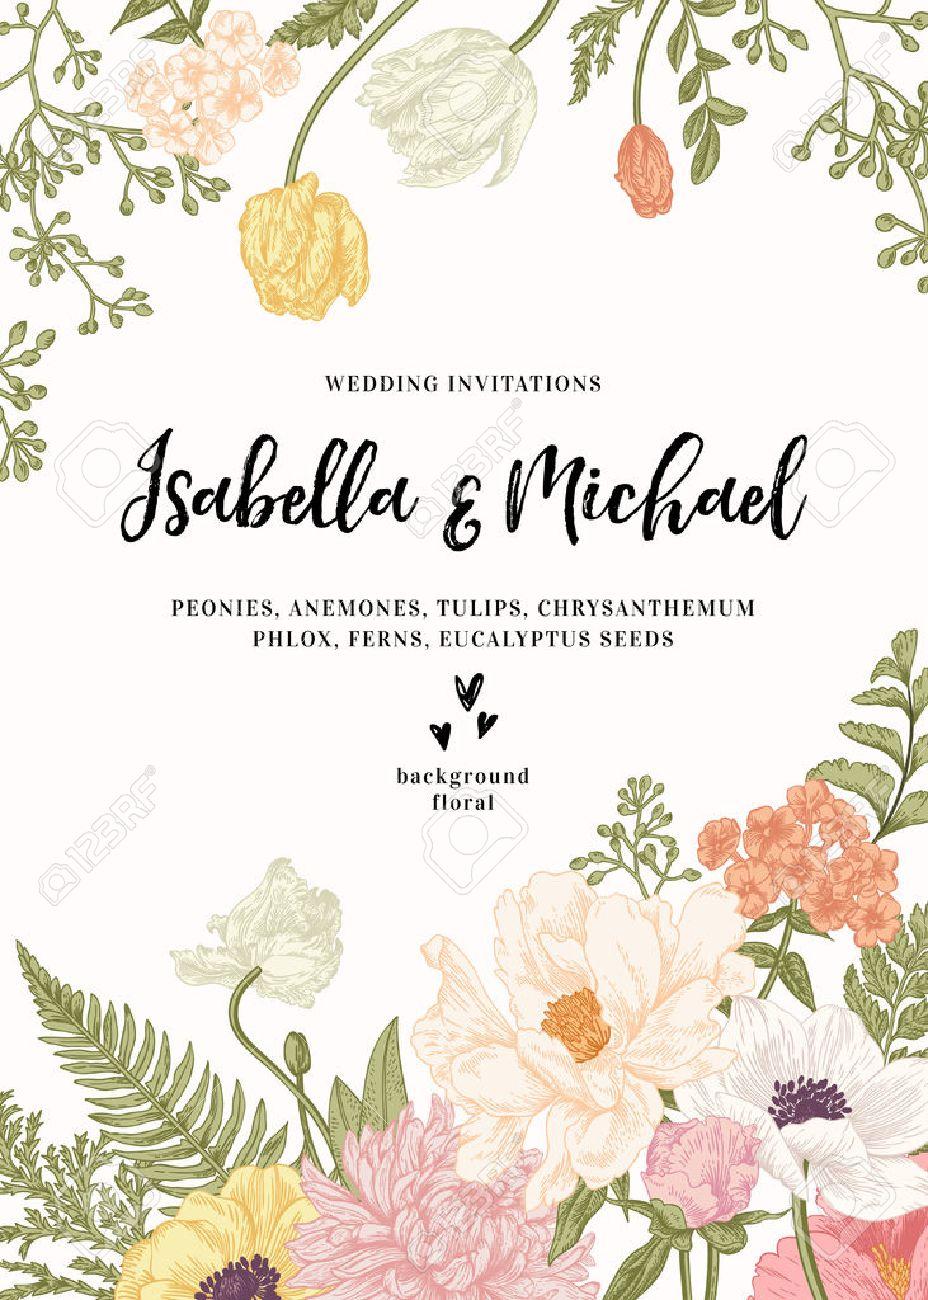 Vintage Wedding Invitation. Summer Garden Flowers. Peonies ...